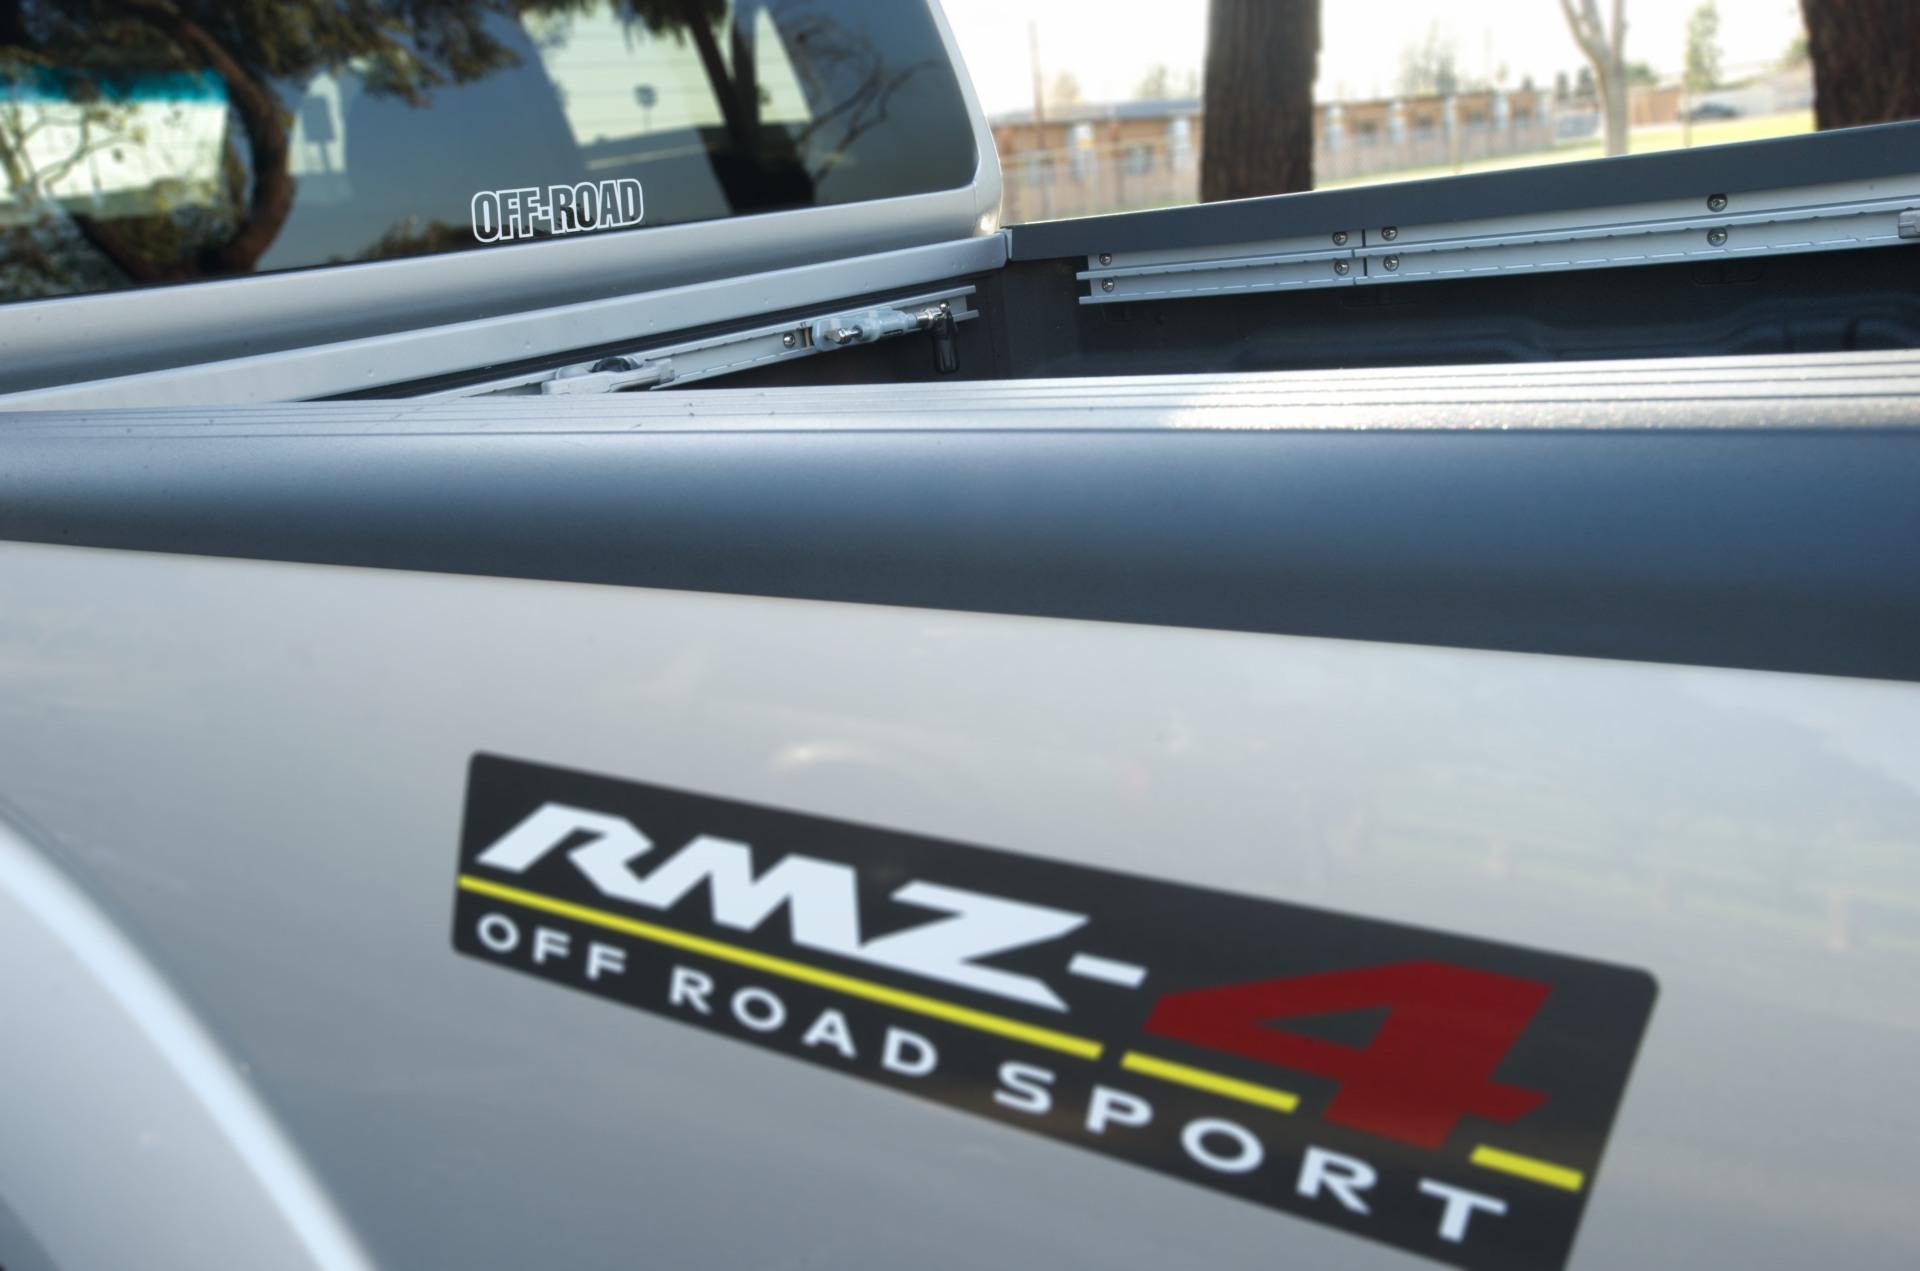 2009 Suzuki Equator Off-Road Custom